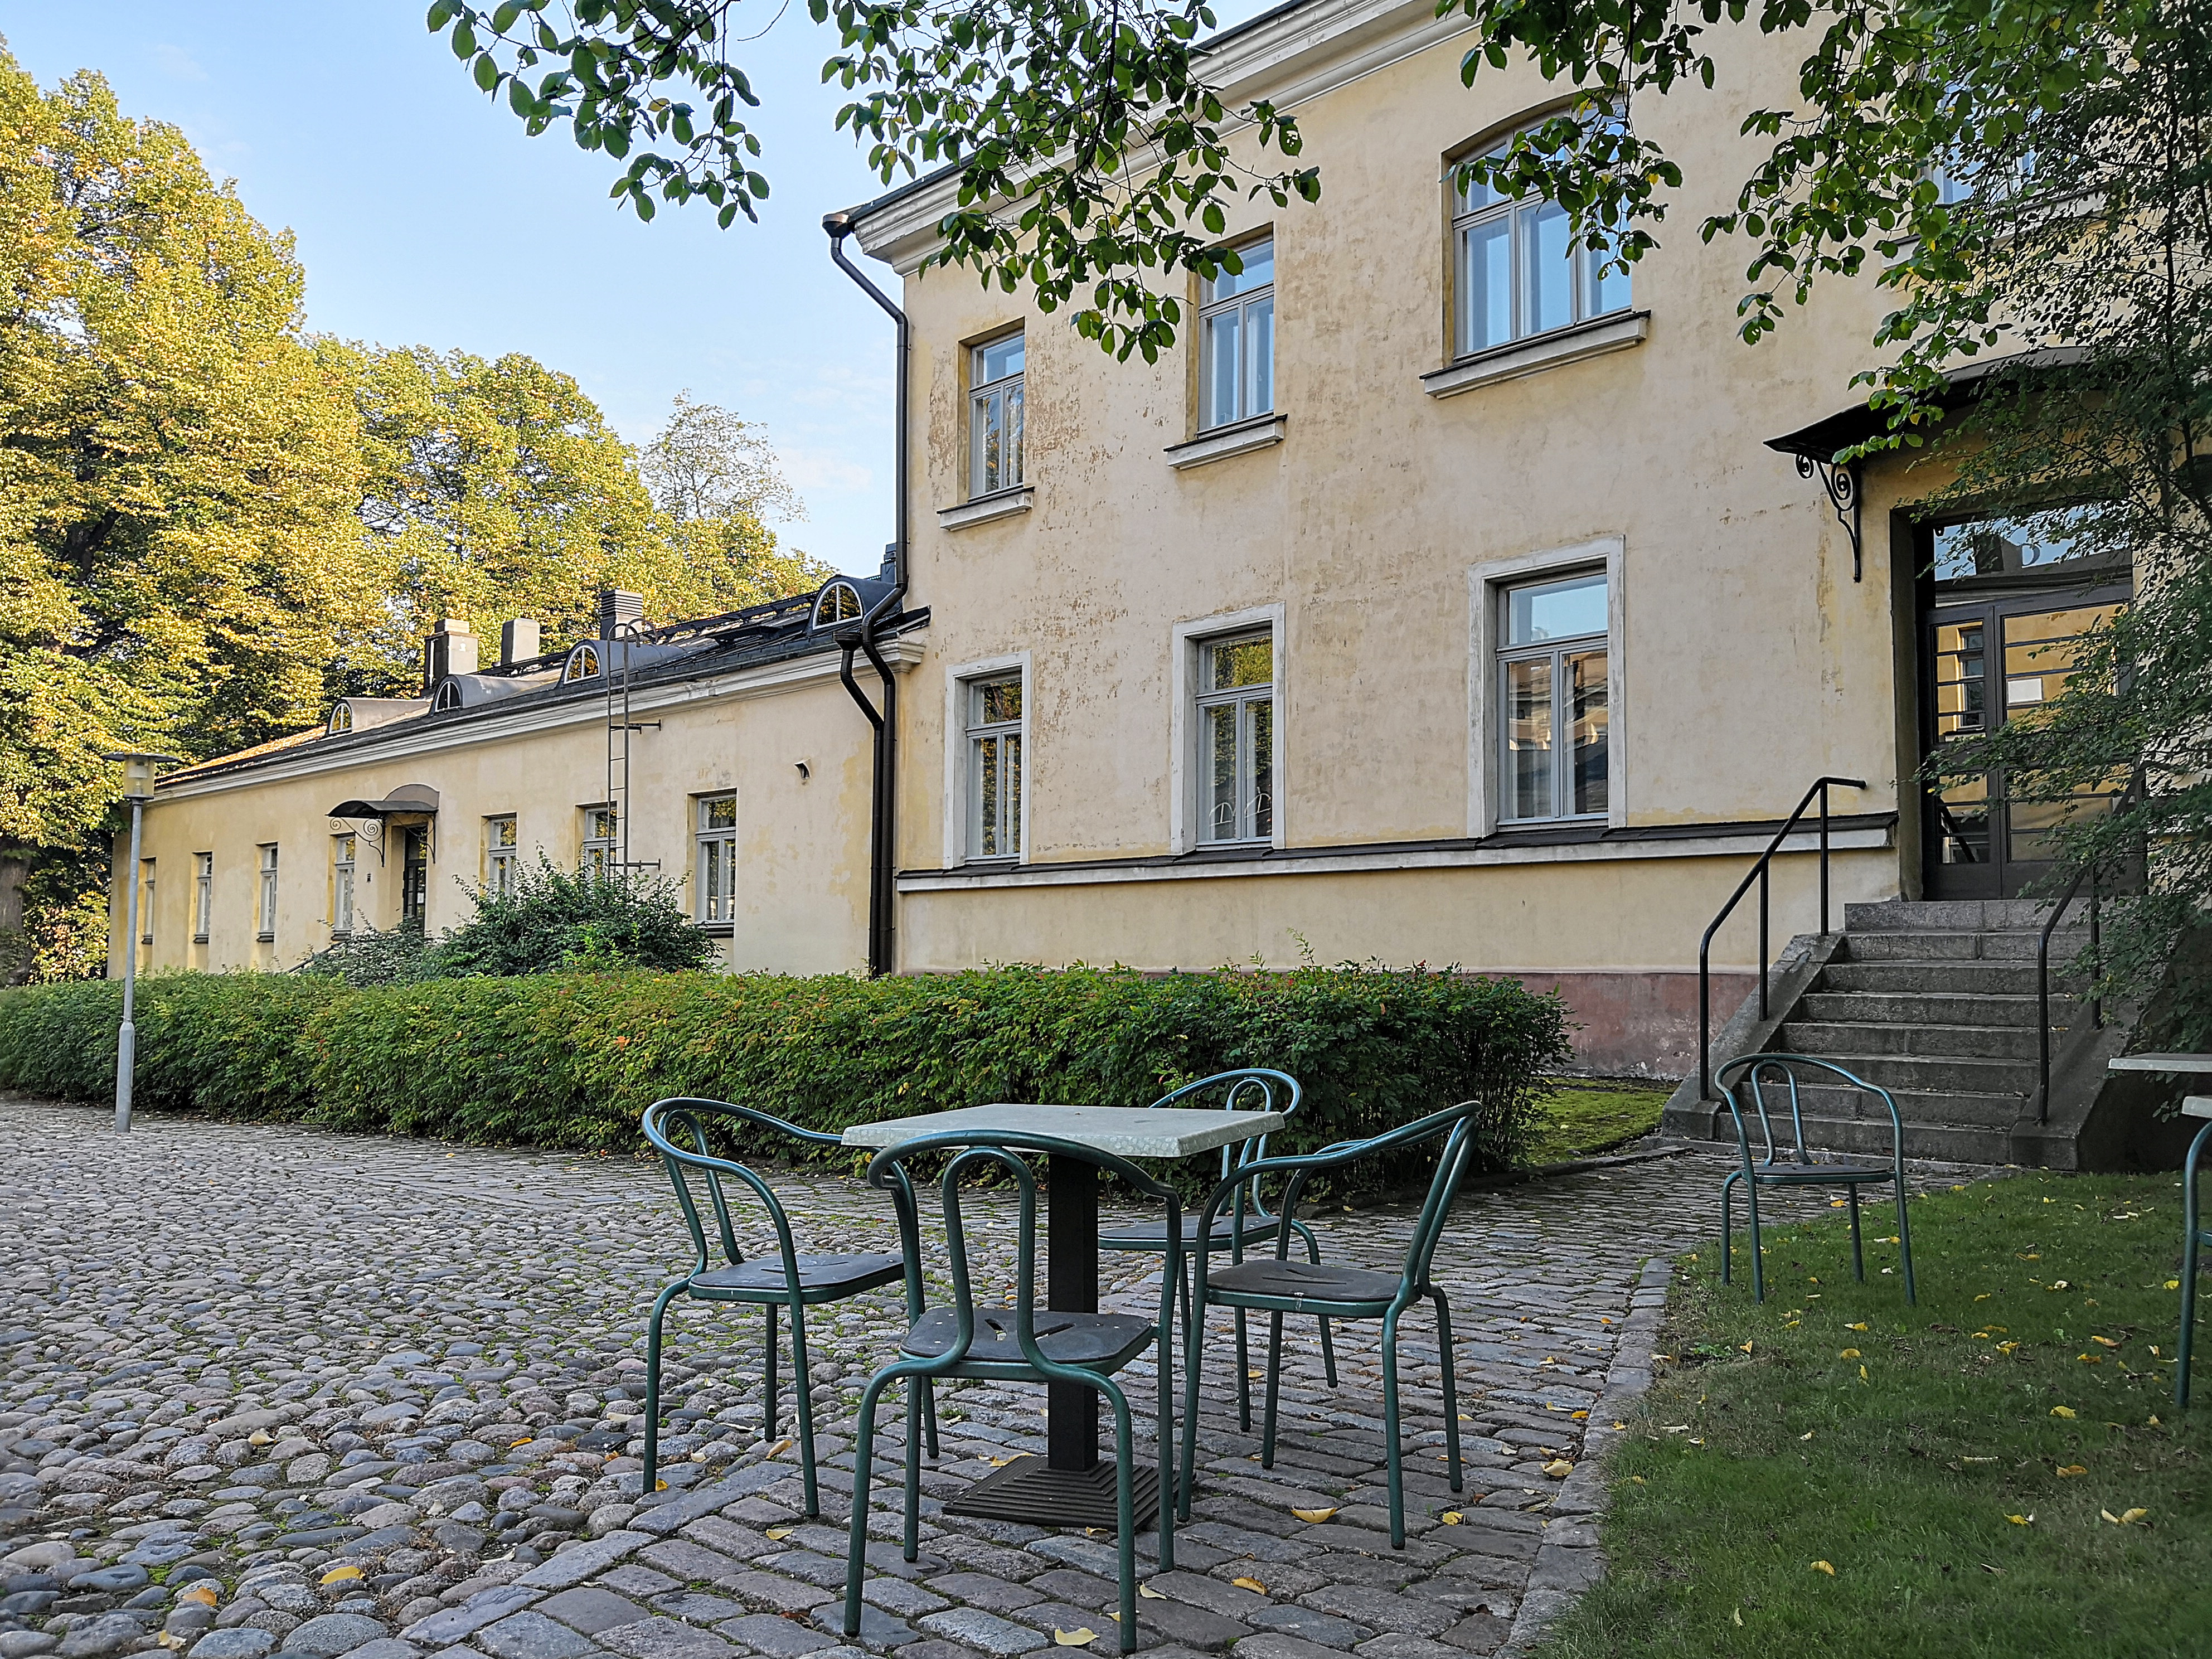 Old Clinic 2 - Marit Henriksson.jpg